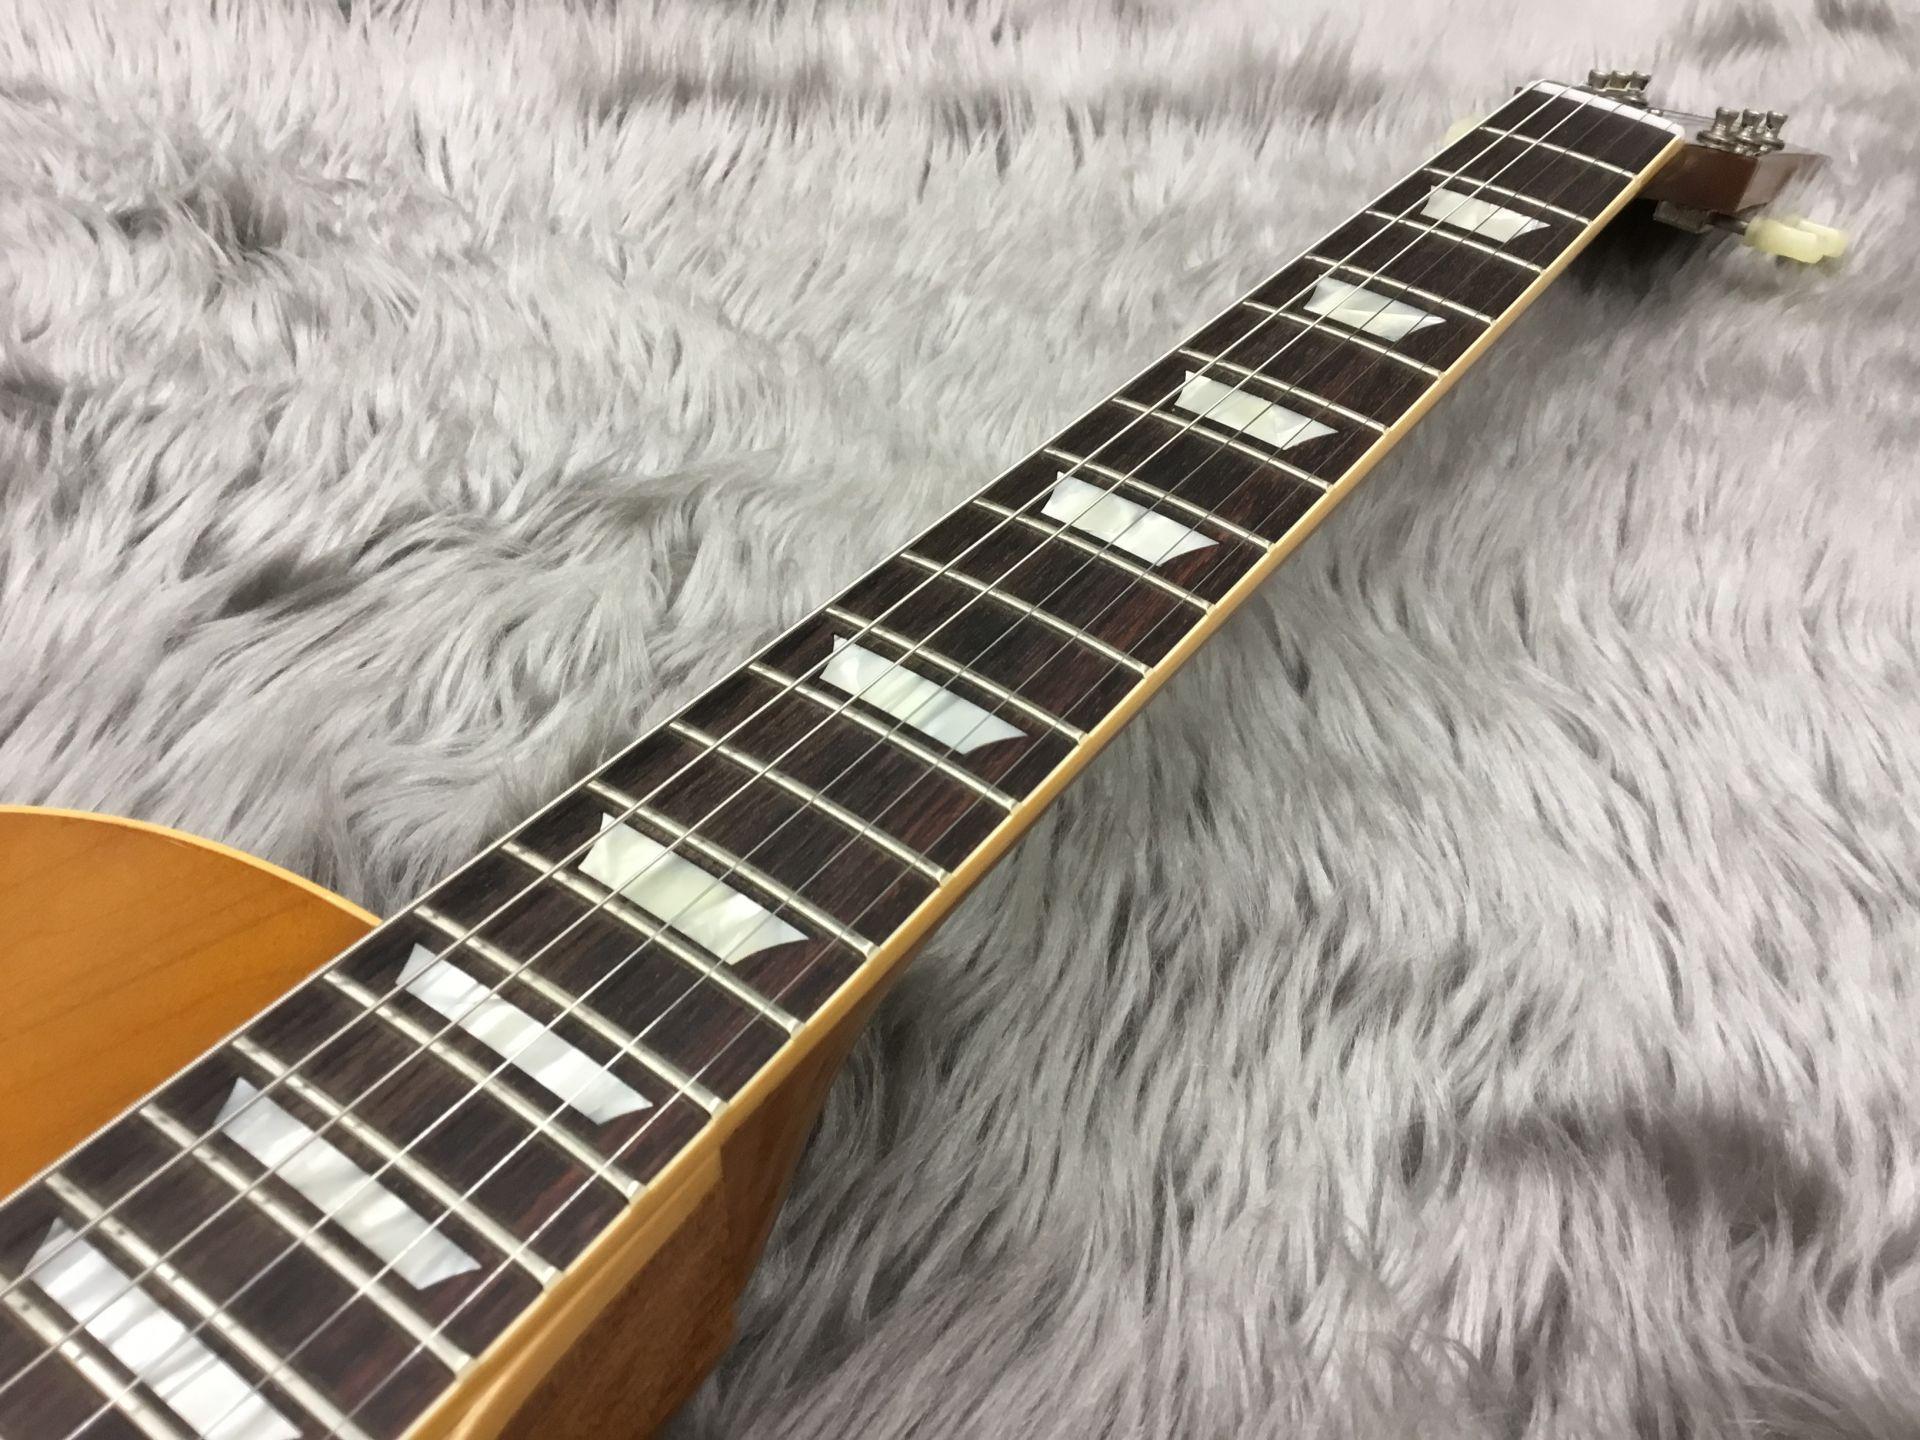 2017 Limited Run 1958 Les Paul Model Hard Rock Maple VOSのボディバック-アップ画像